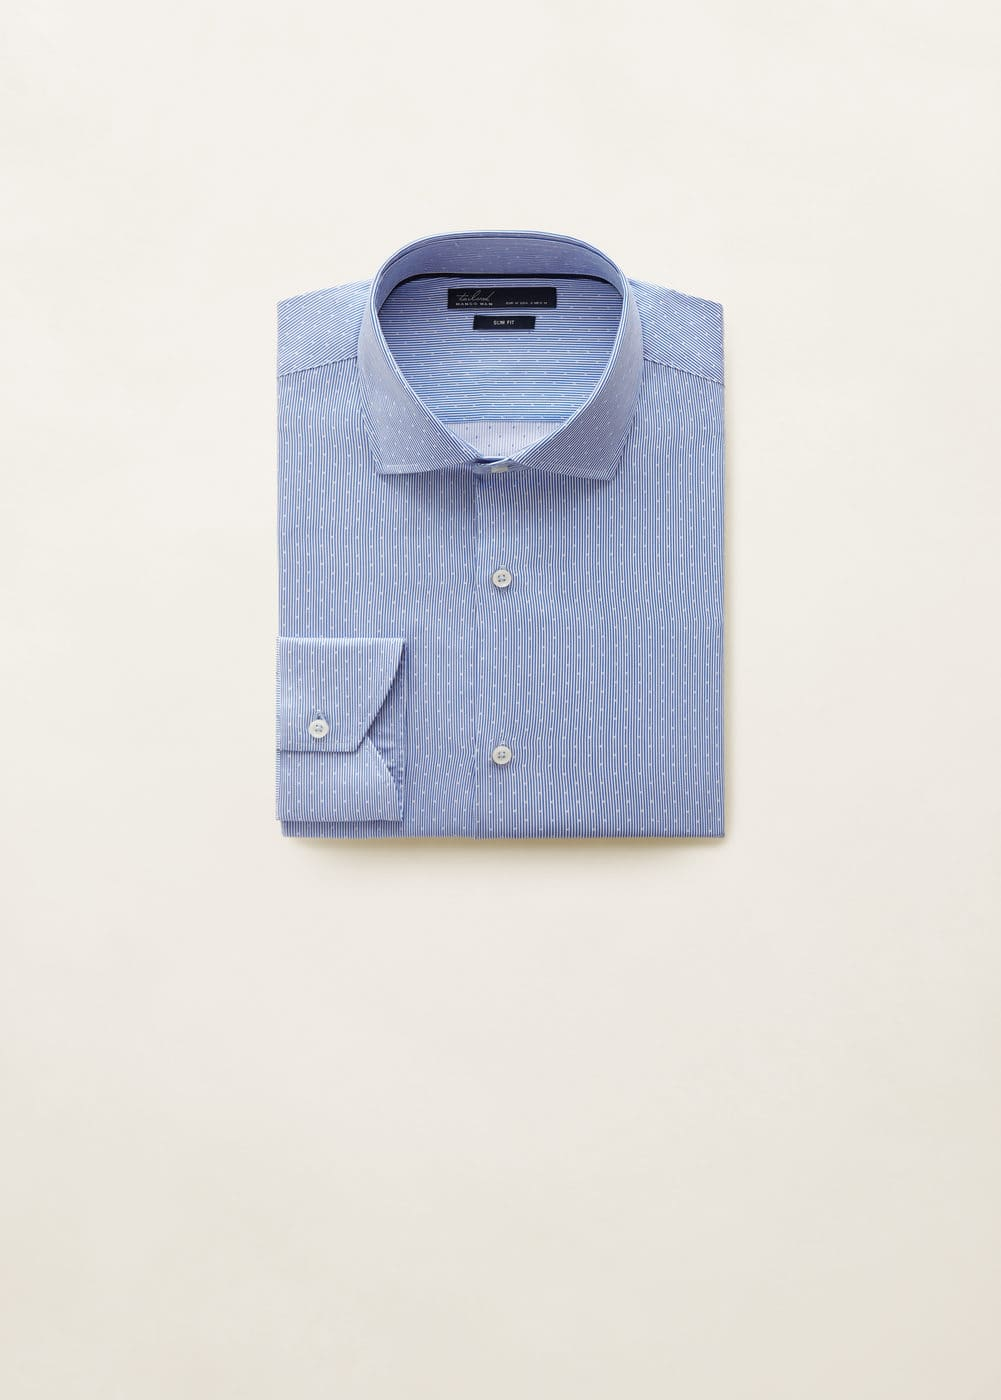 Mango - Camisa Tailored slim fit algodón - 7